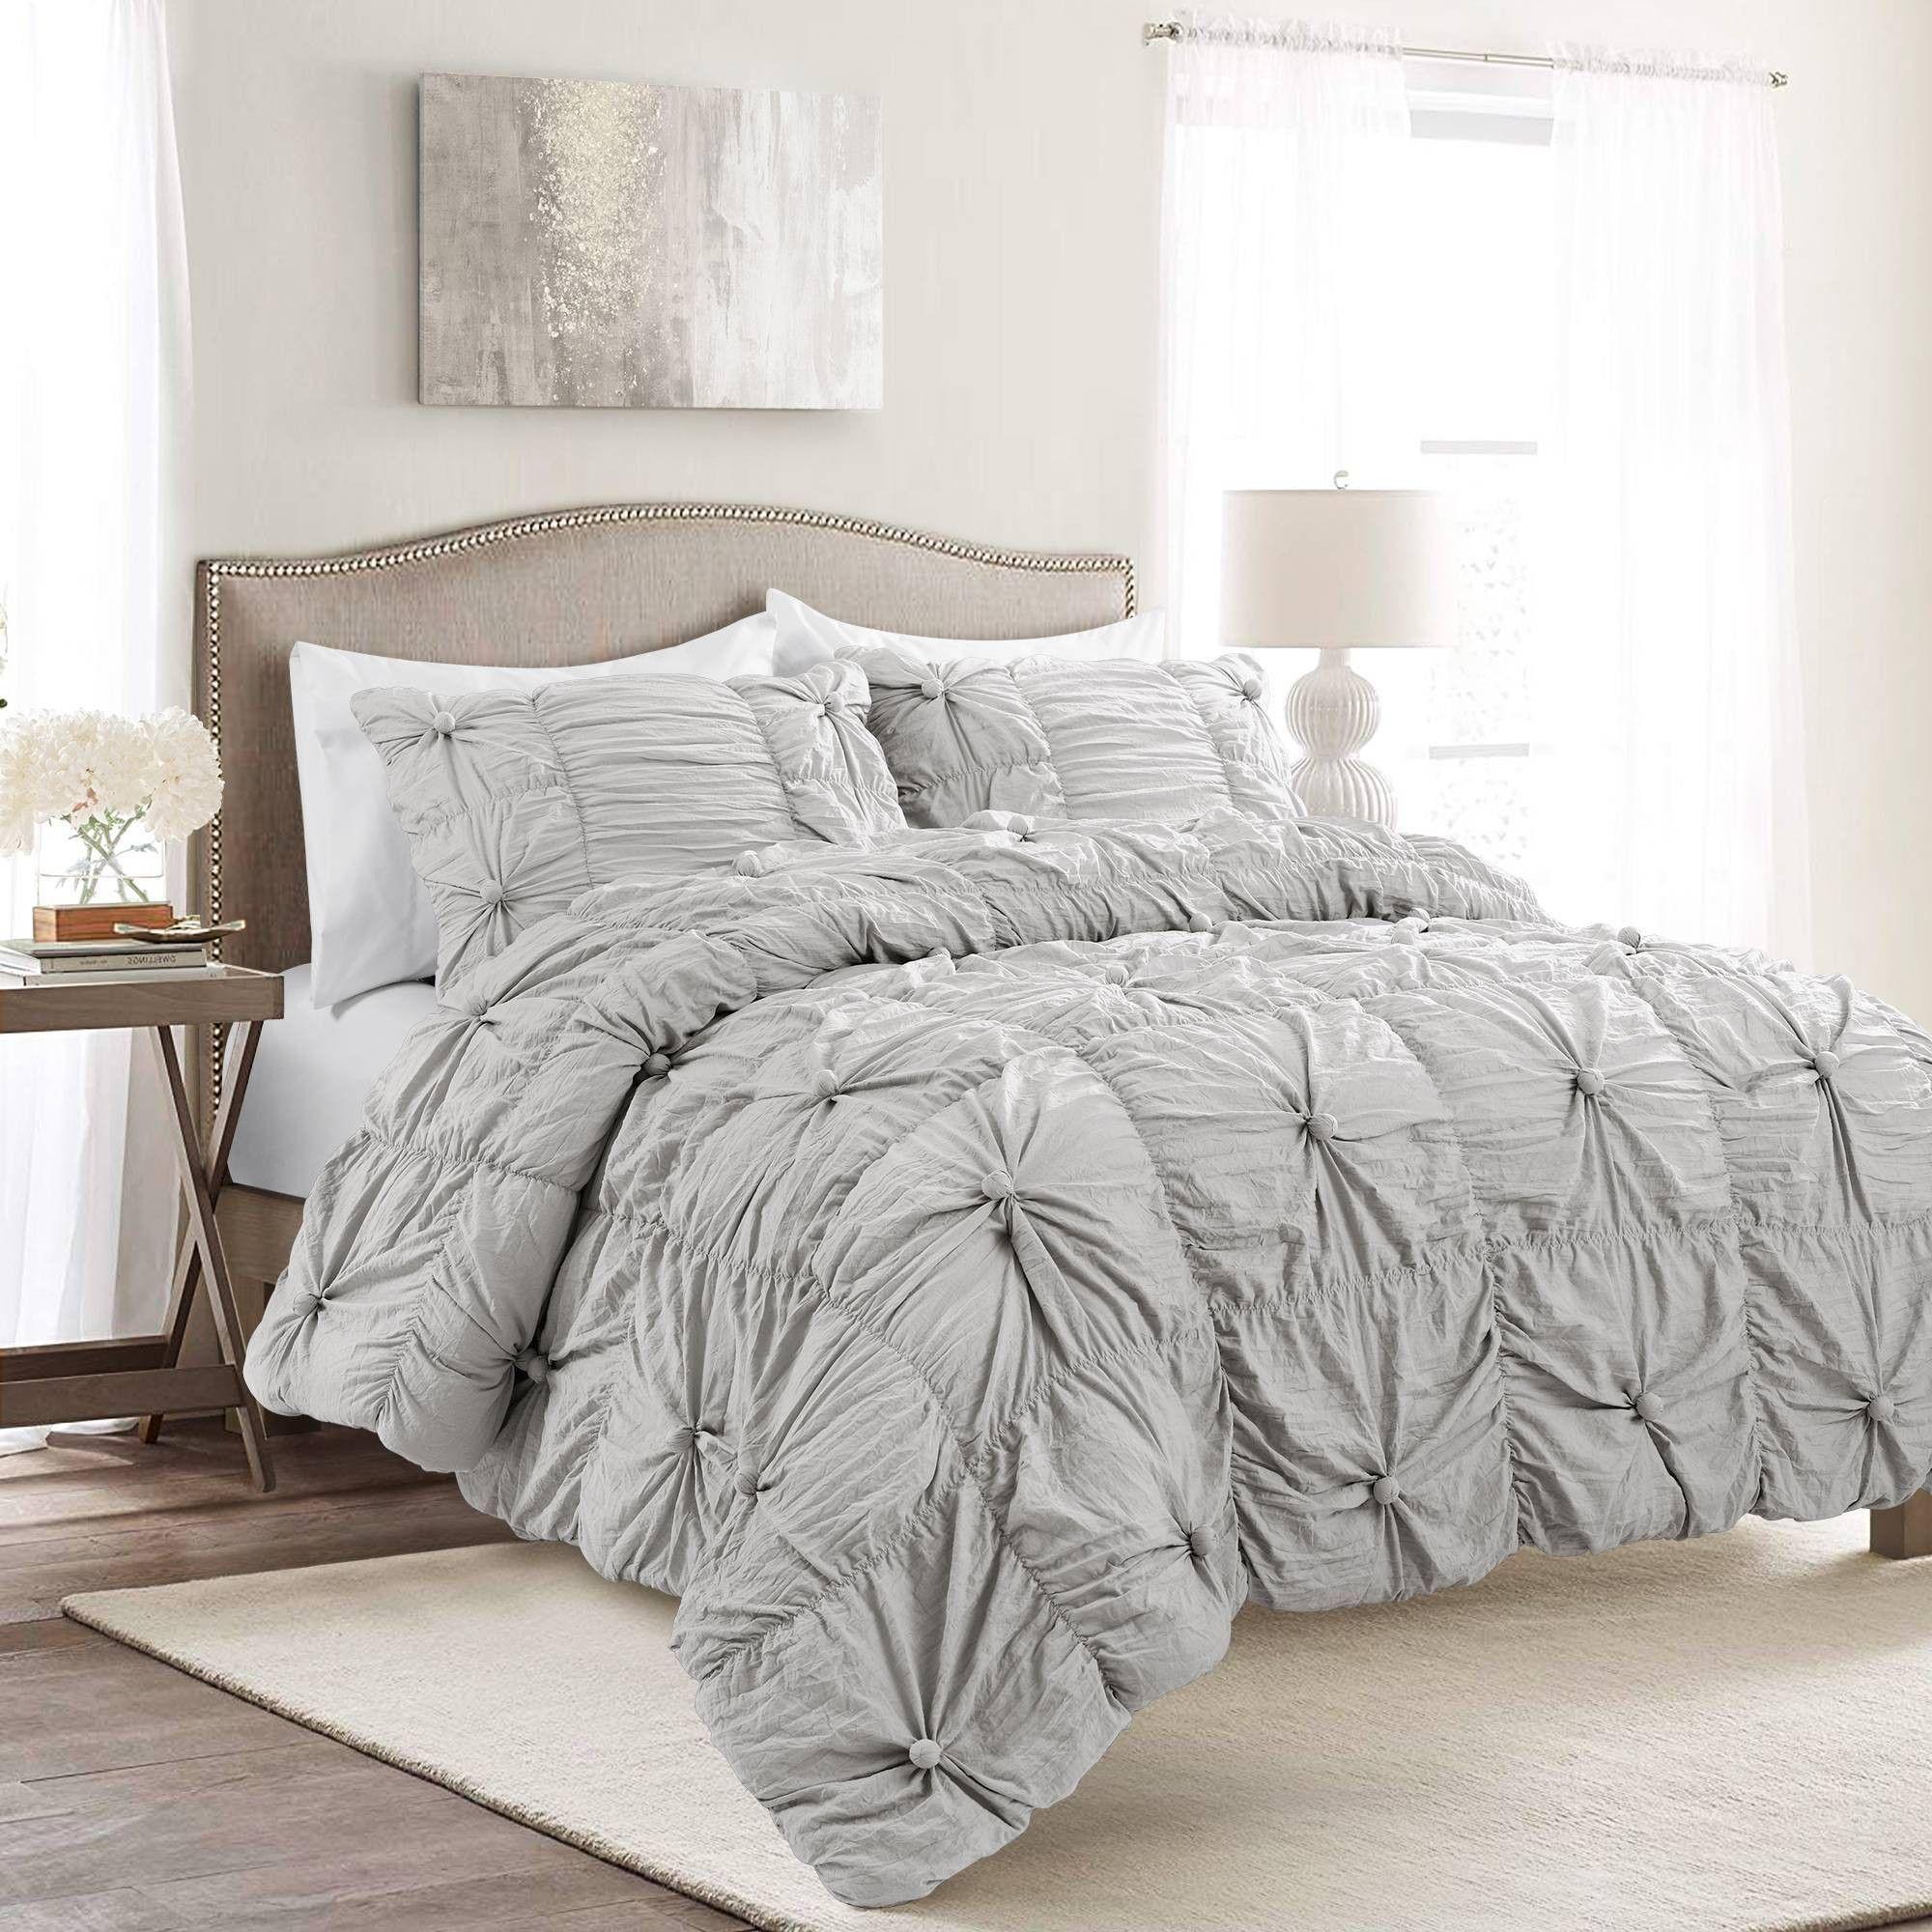 Full/Queen 3pc Bella Comforter & Sham Set Light Gray